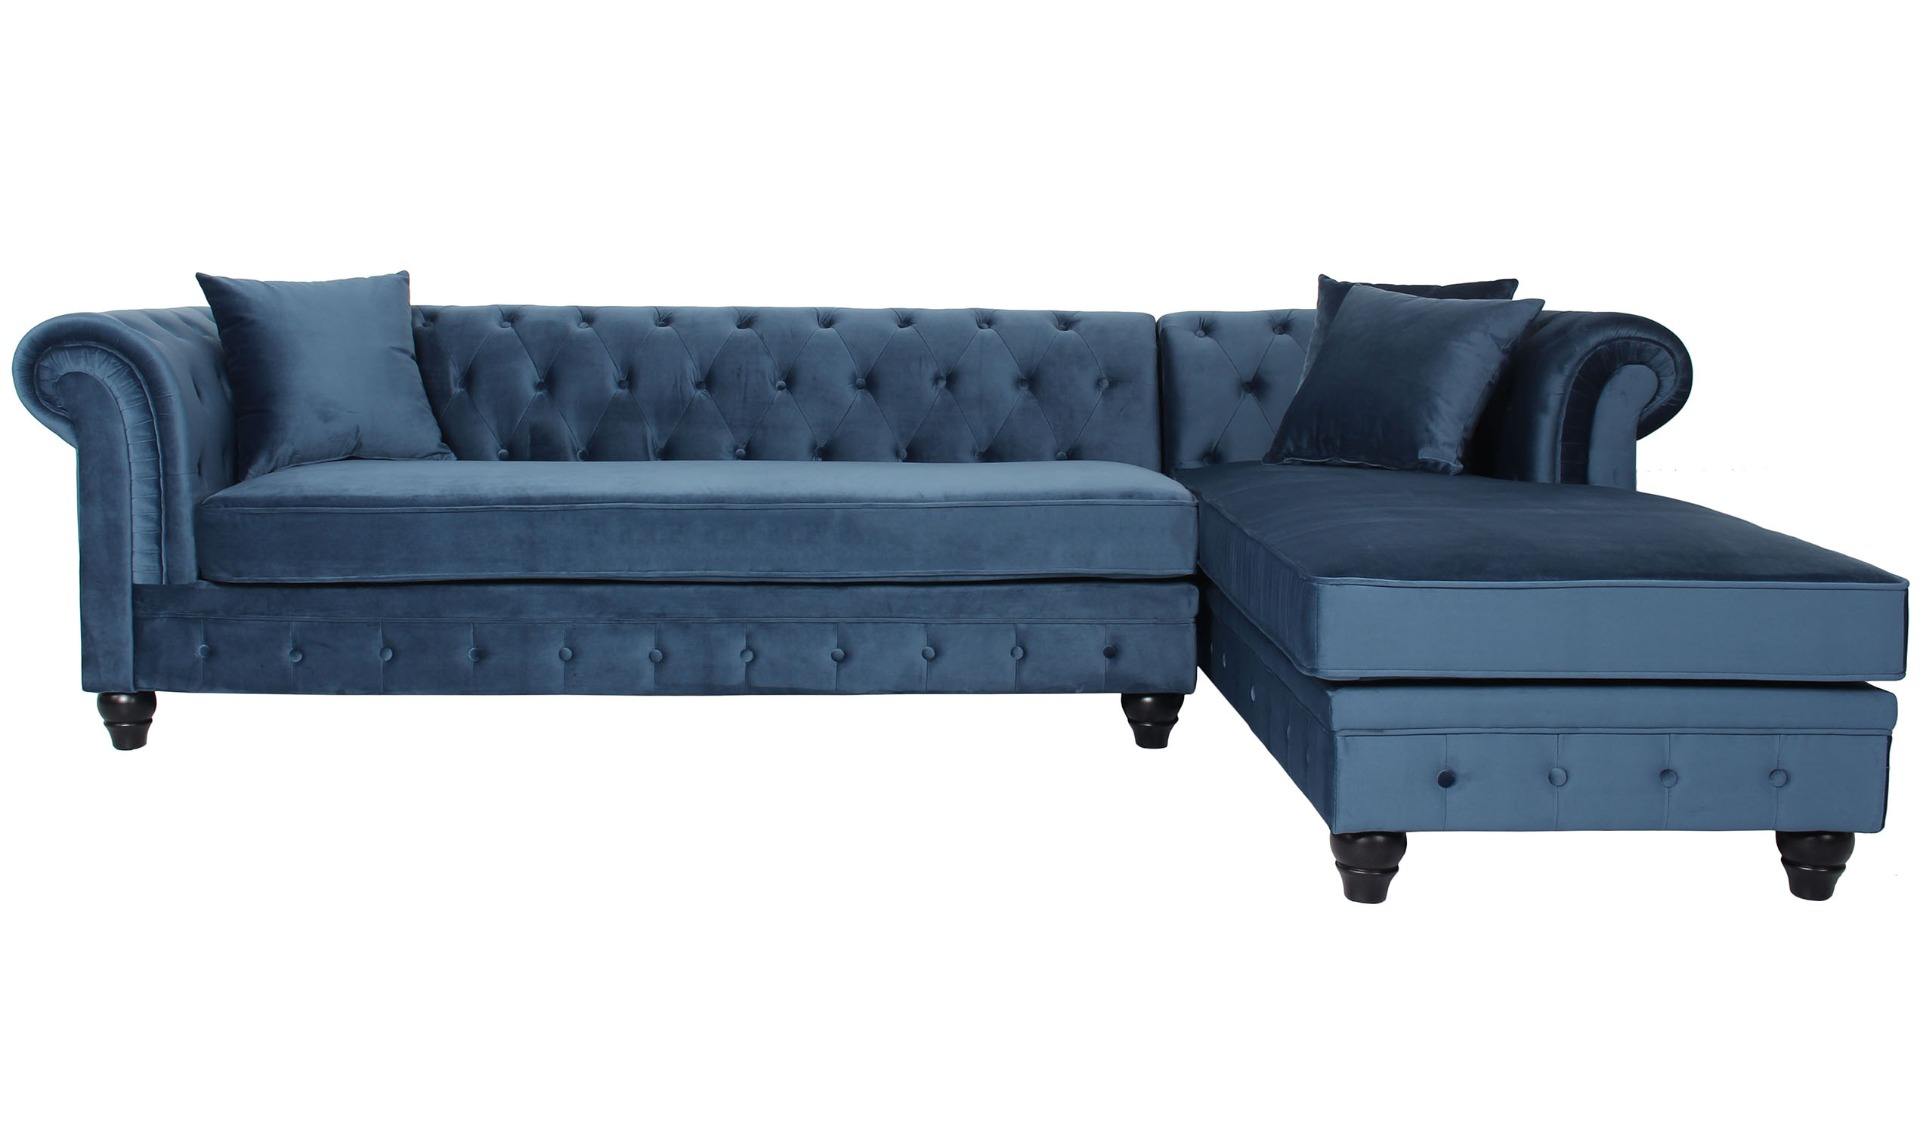 Canapé d'angle capitonné style chesterfield Roosevelt Velours Bleu